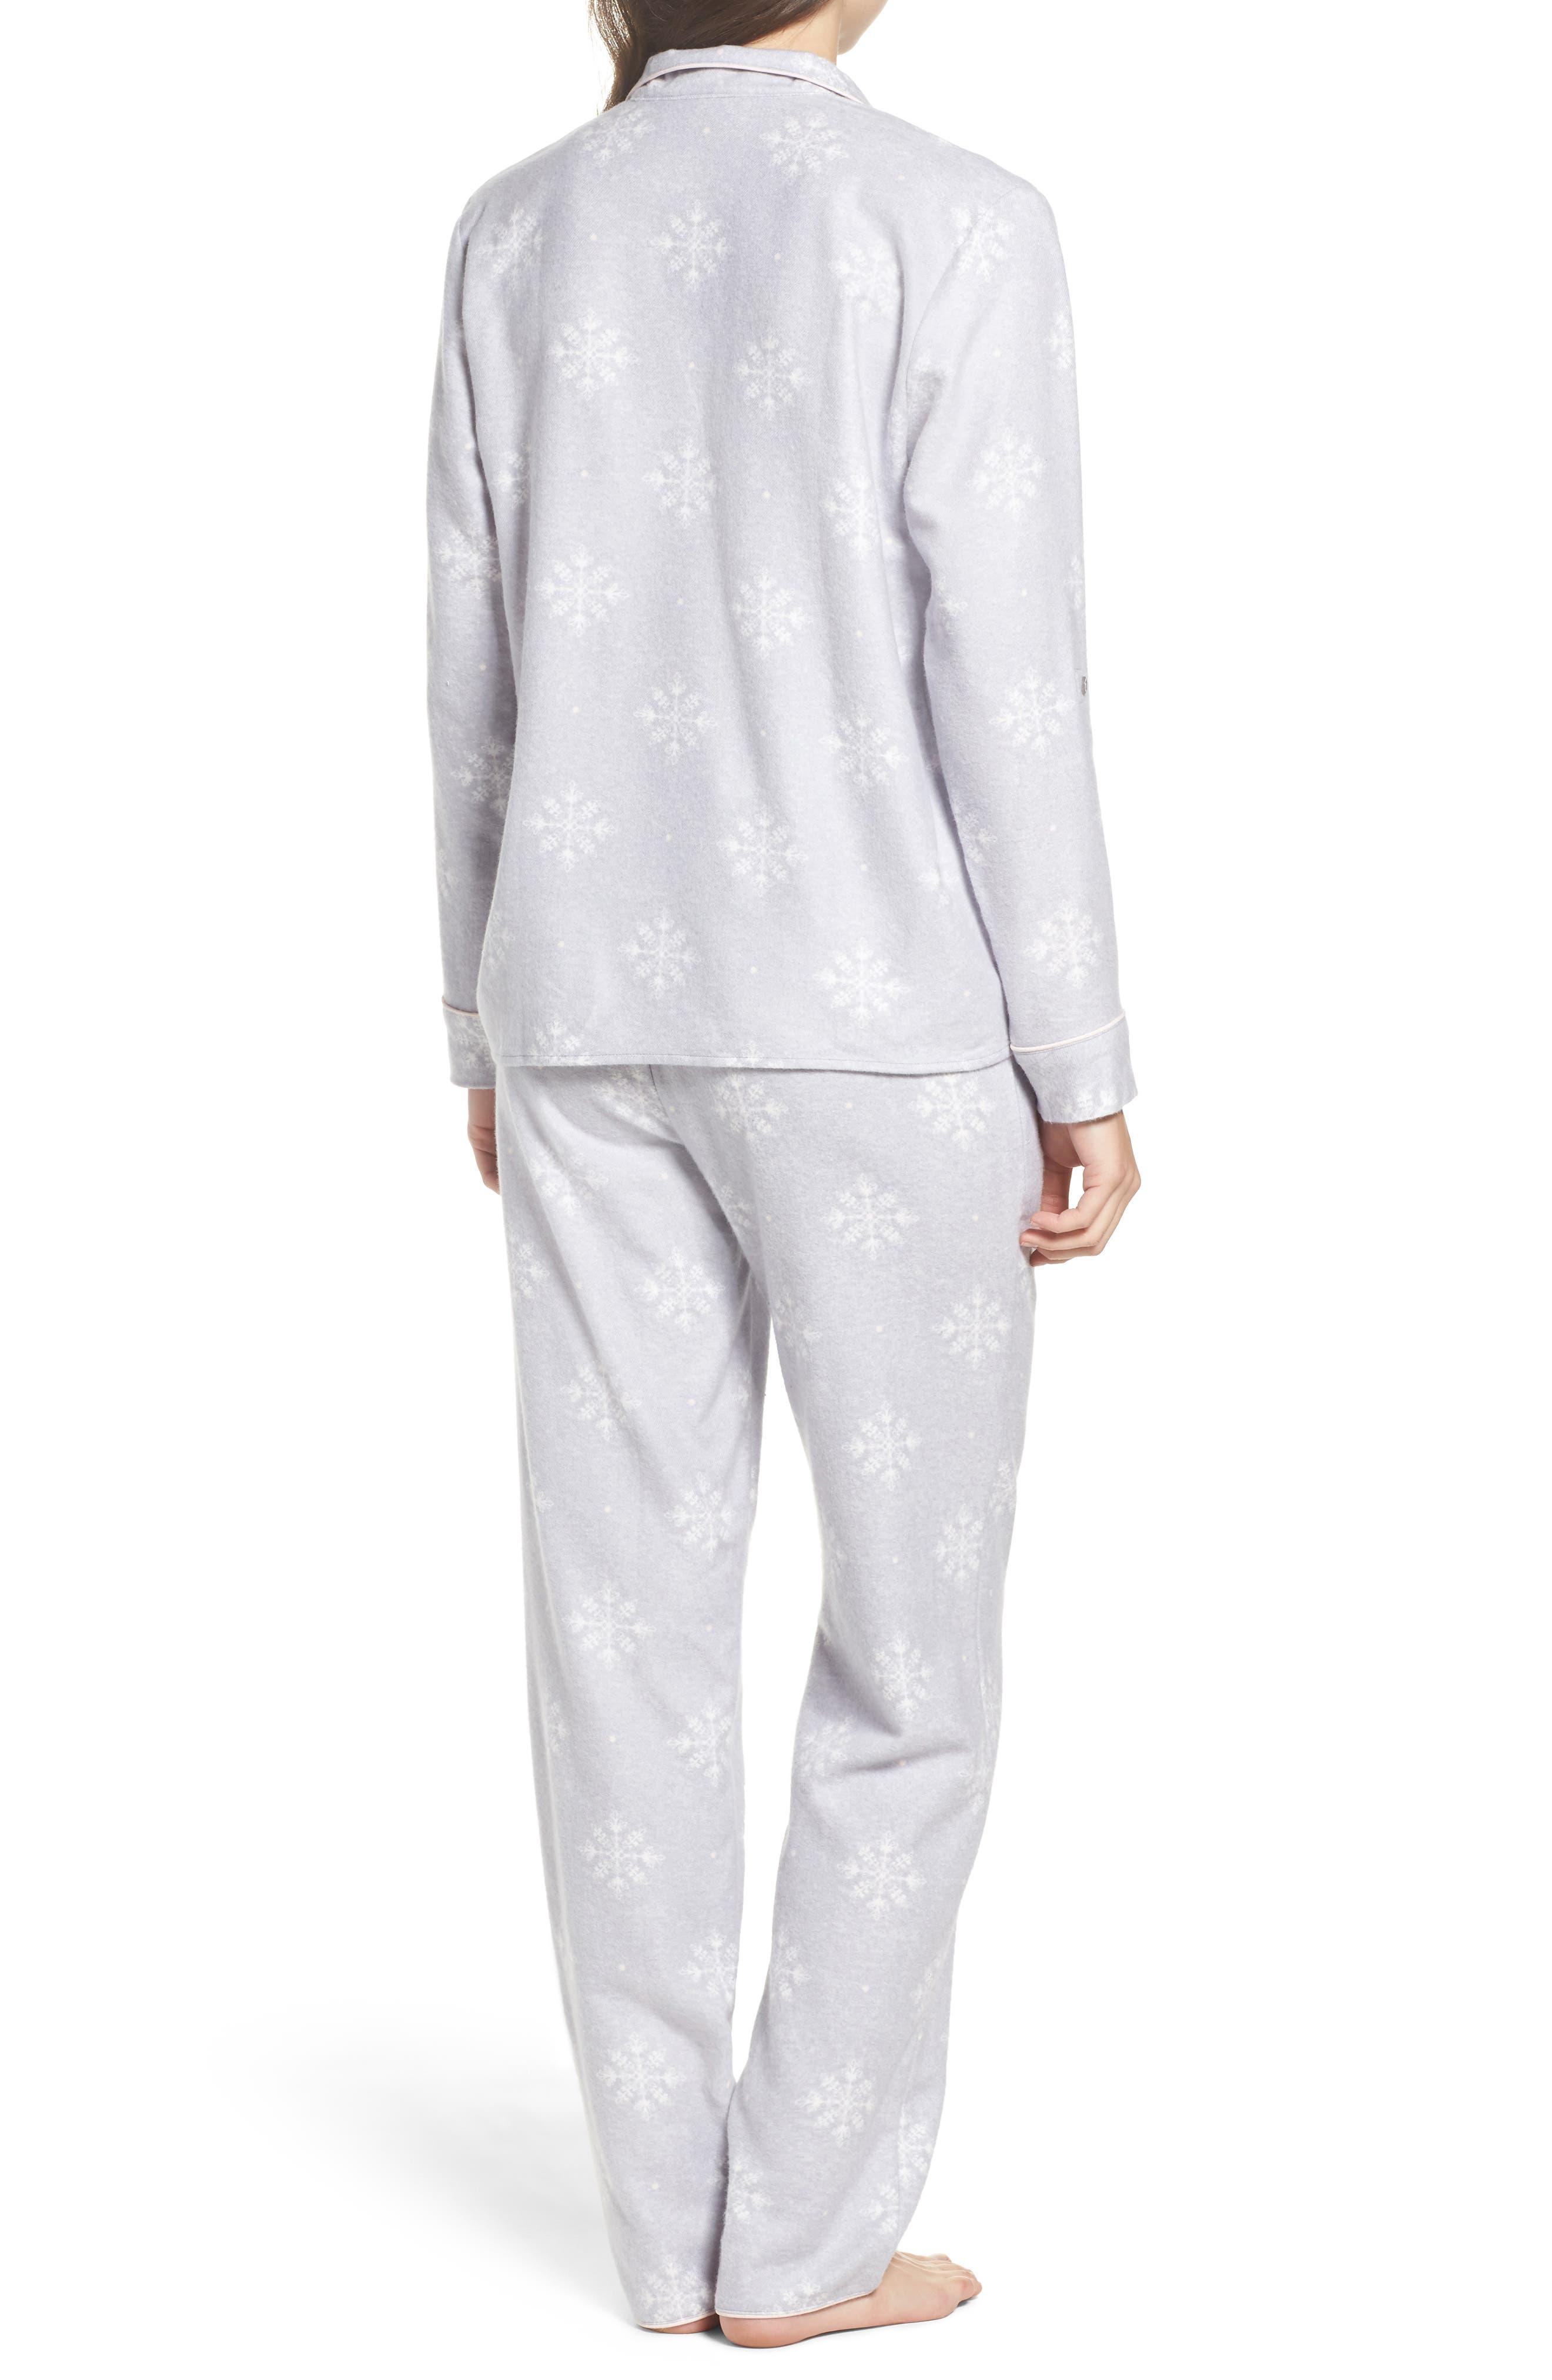 Lingerie Starlight Flannel Pajamas,                             Alternate thumbnail 6, color,